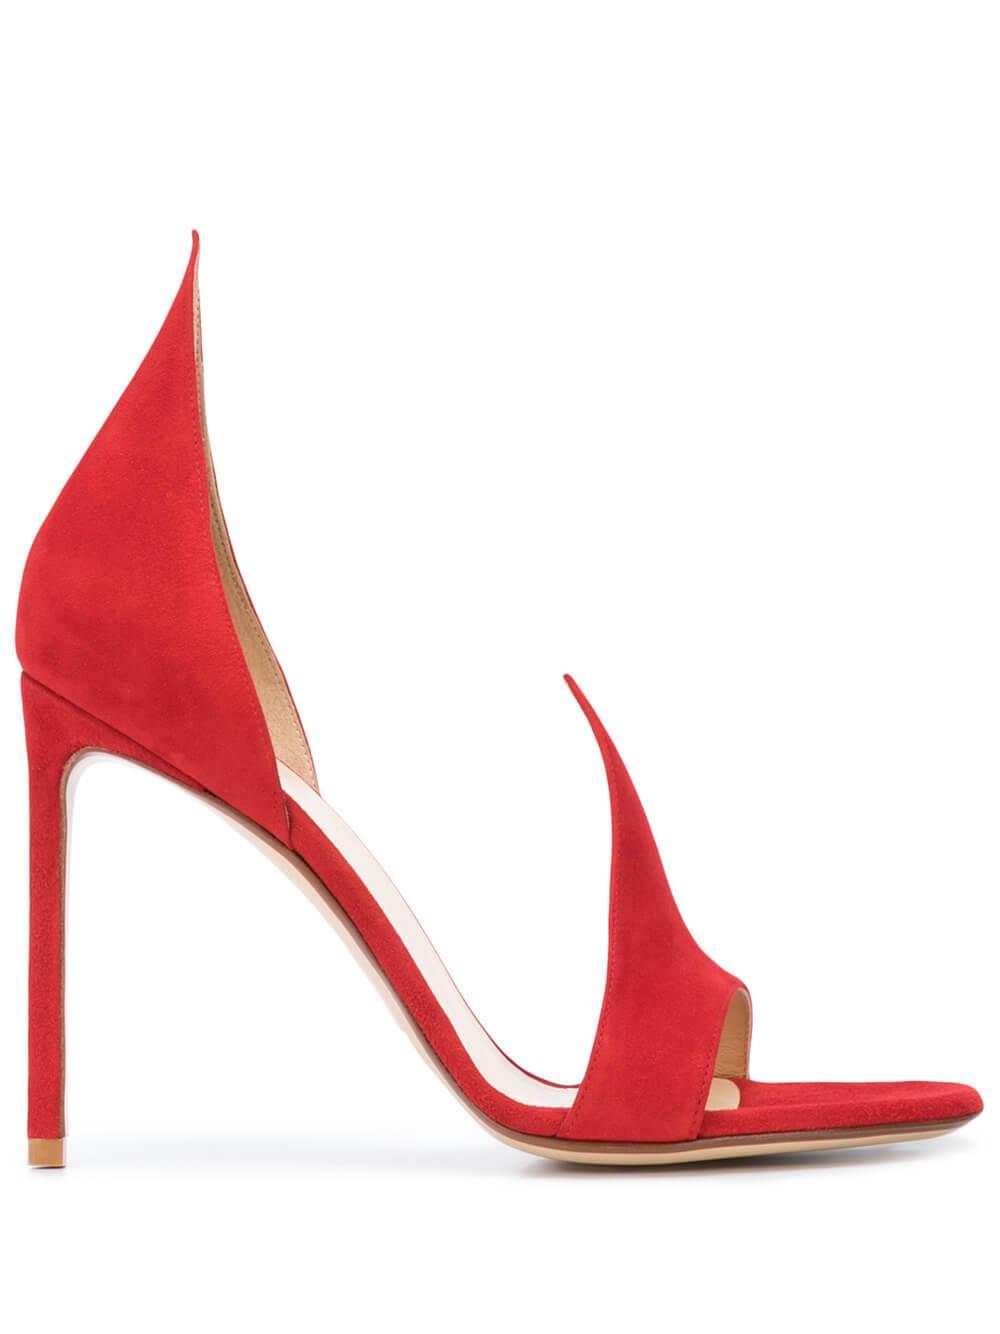 Suede 105mm Sandal Item # R1S087-201-R20